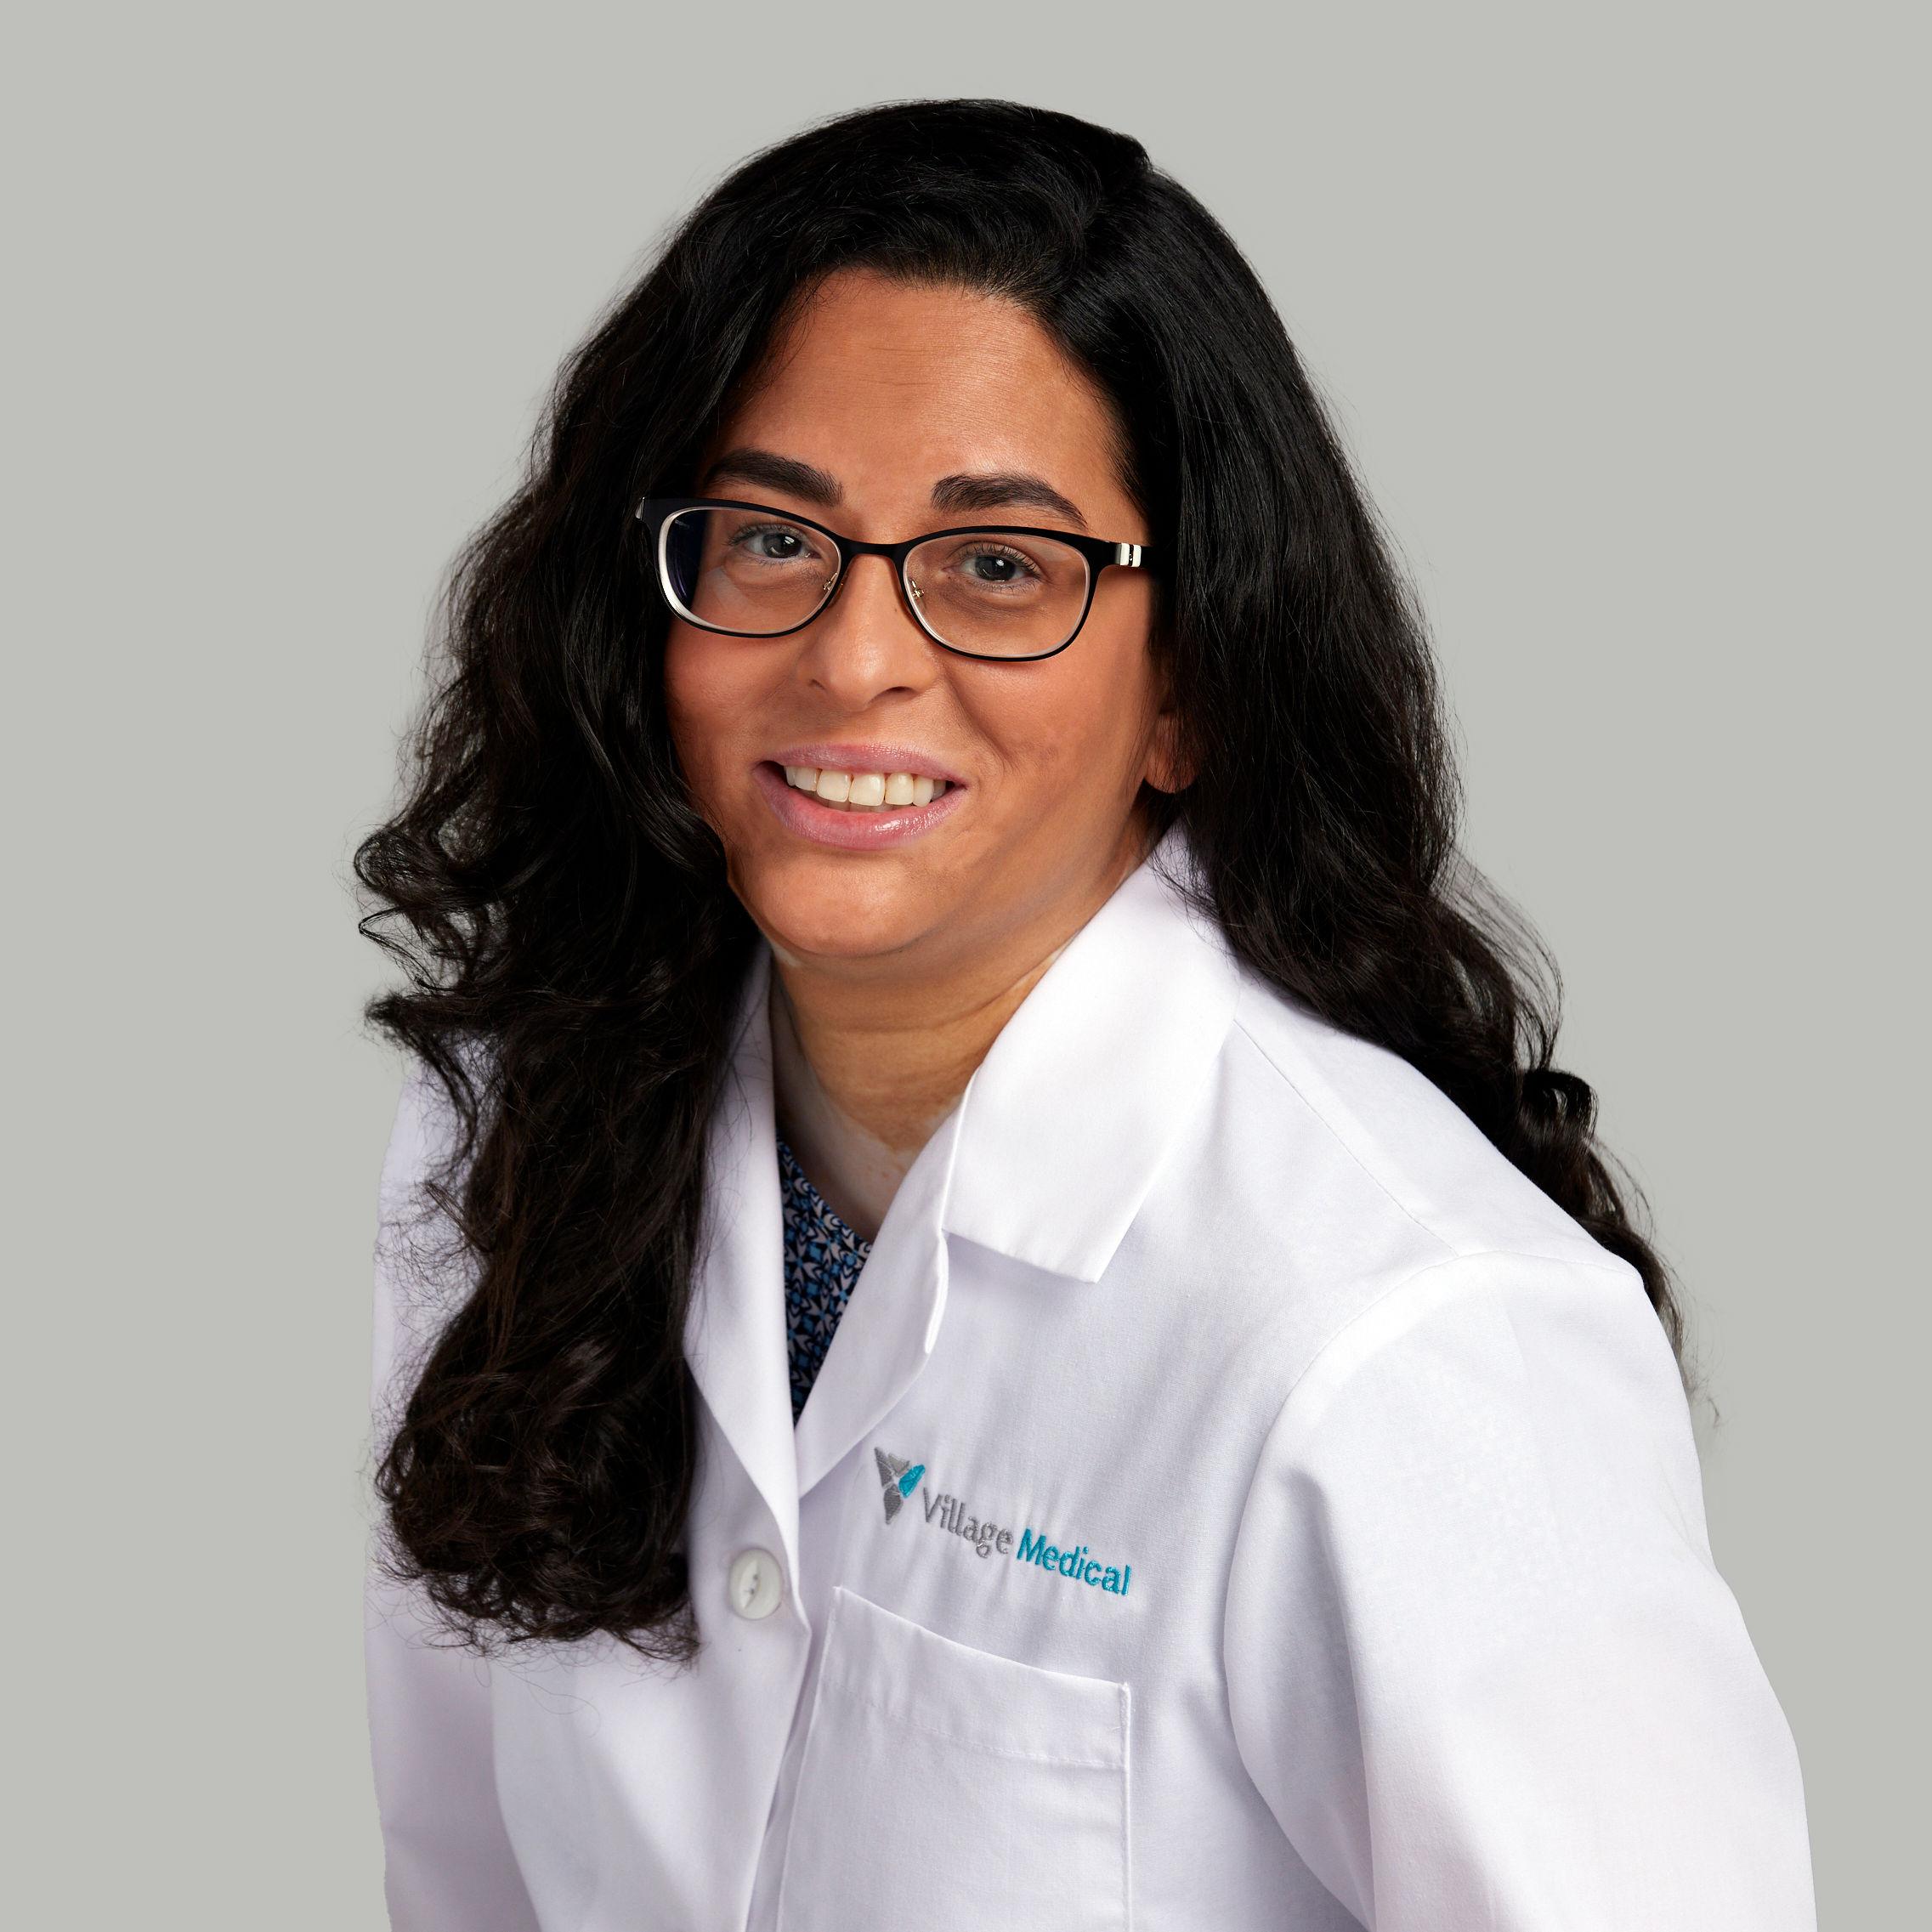 Shobha Patil, MD